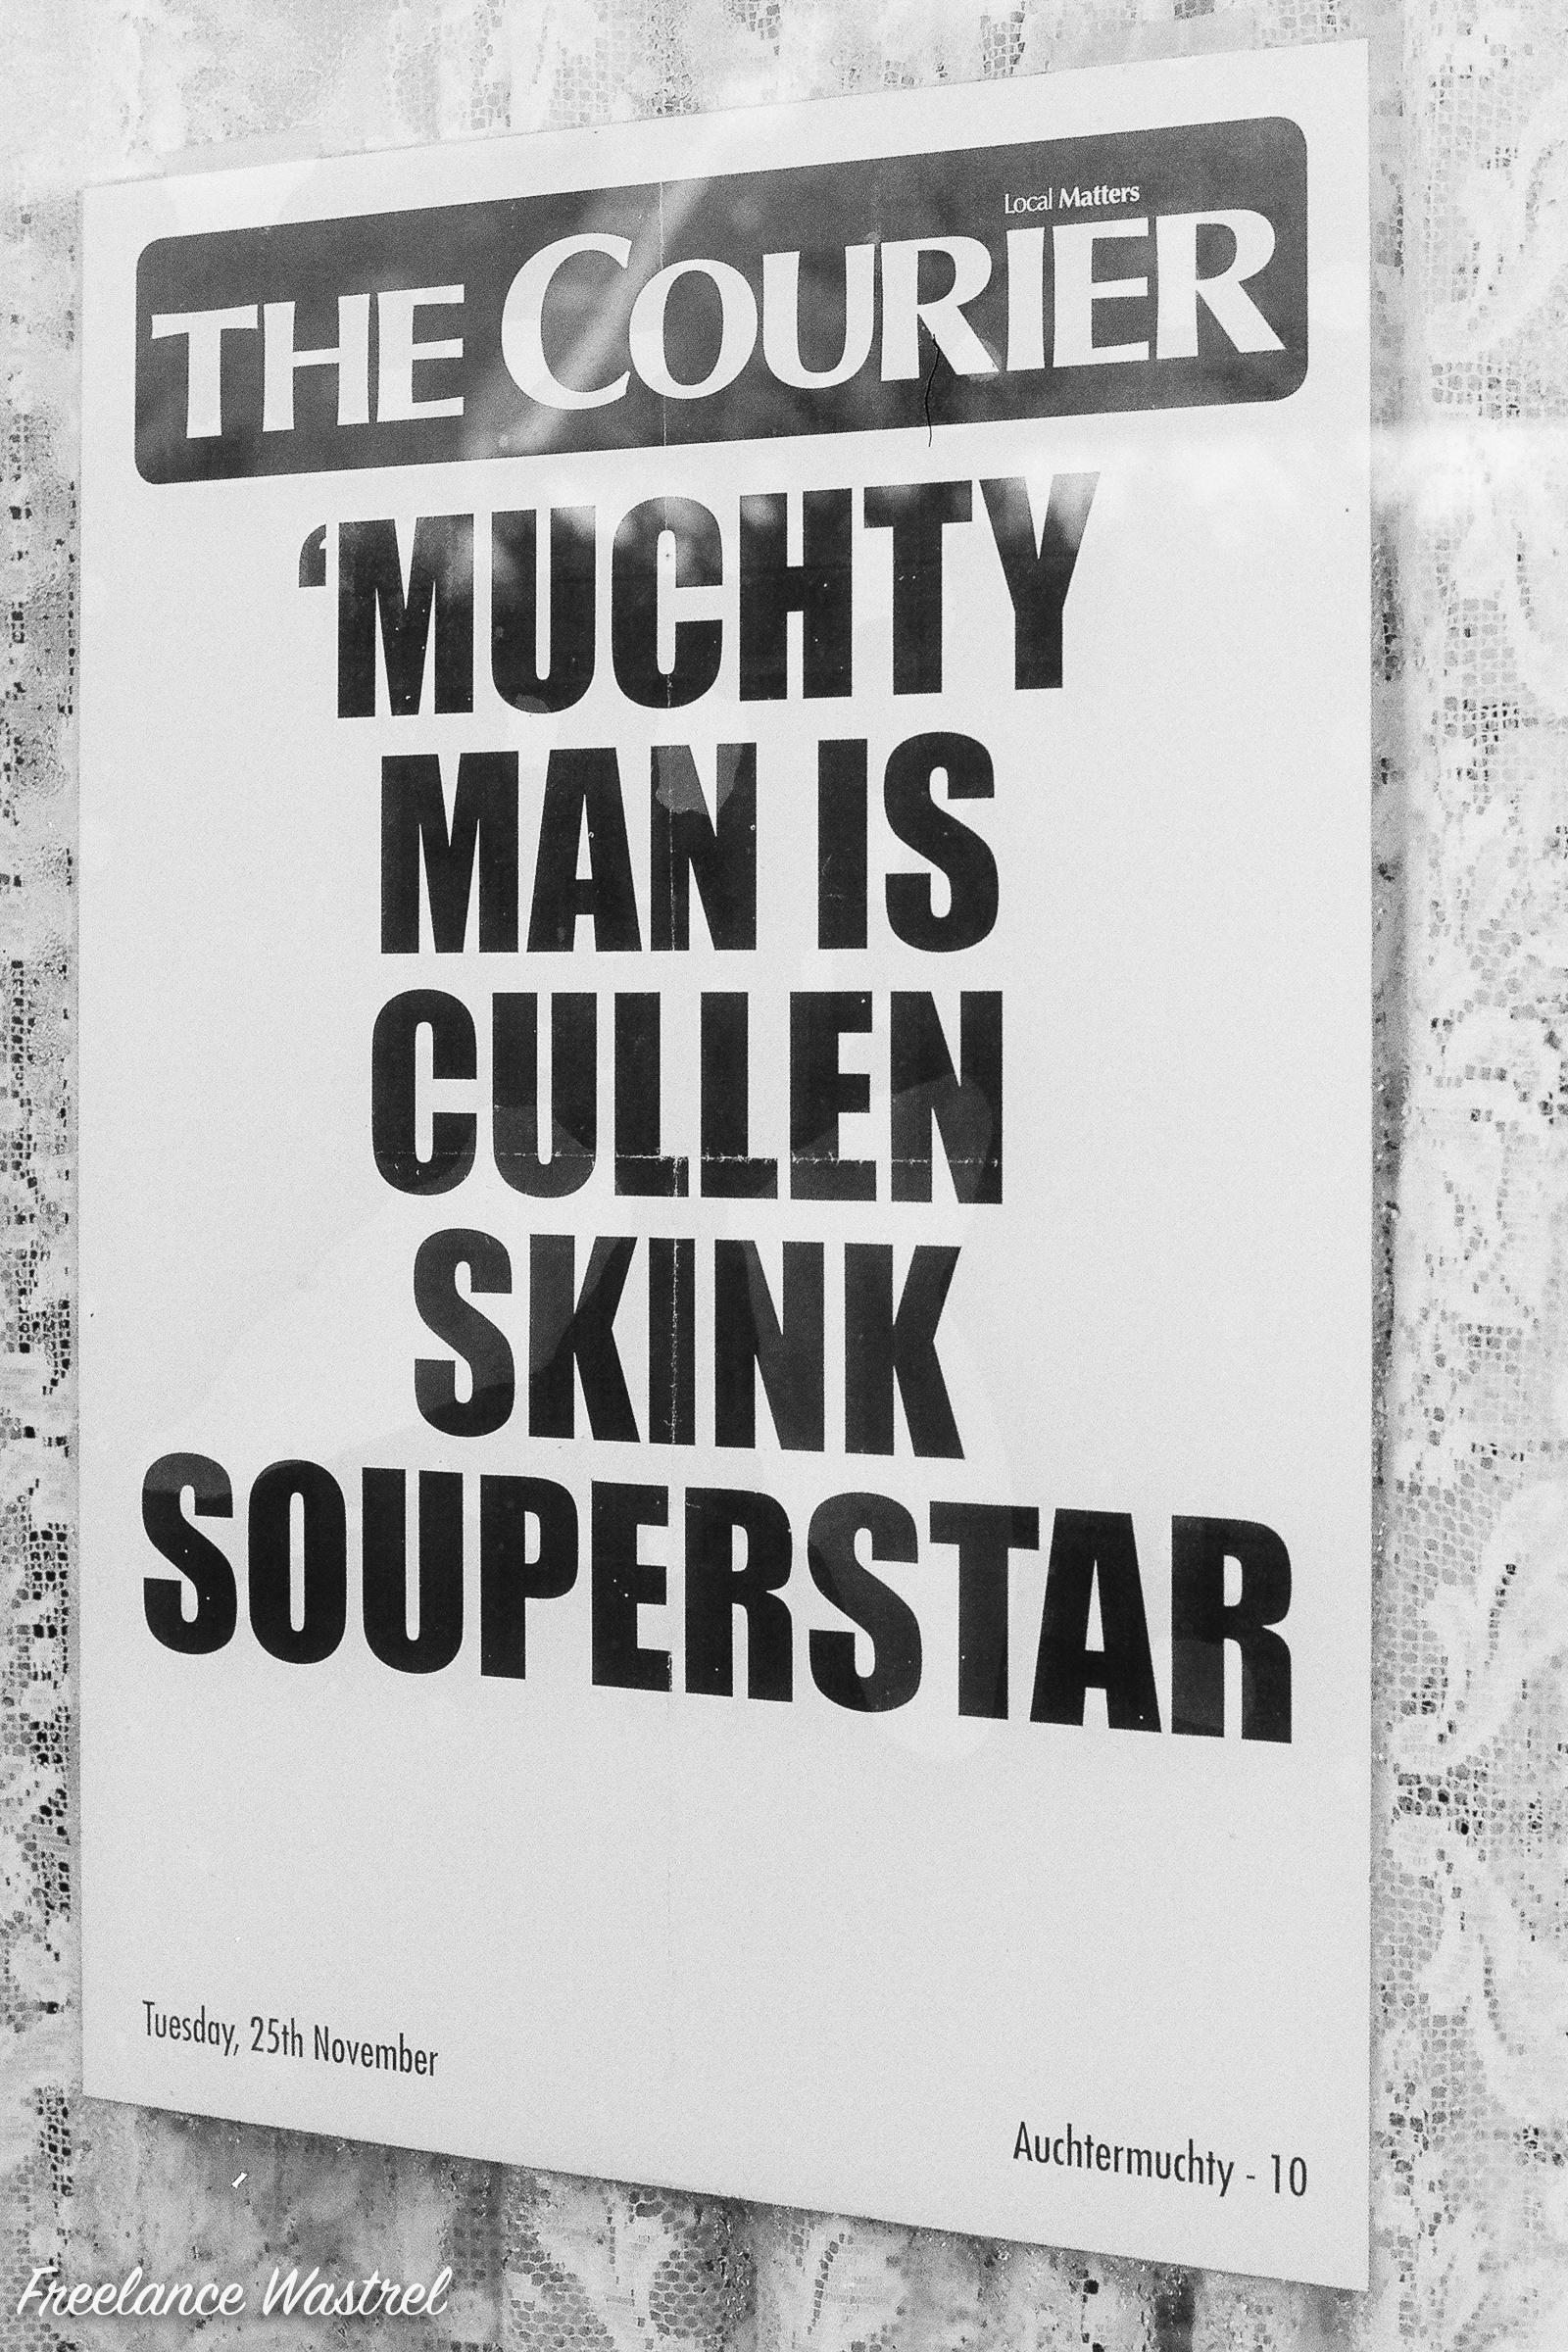 Muchty Man is Cullen Skink Souperstar